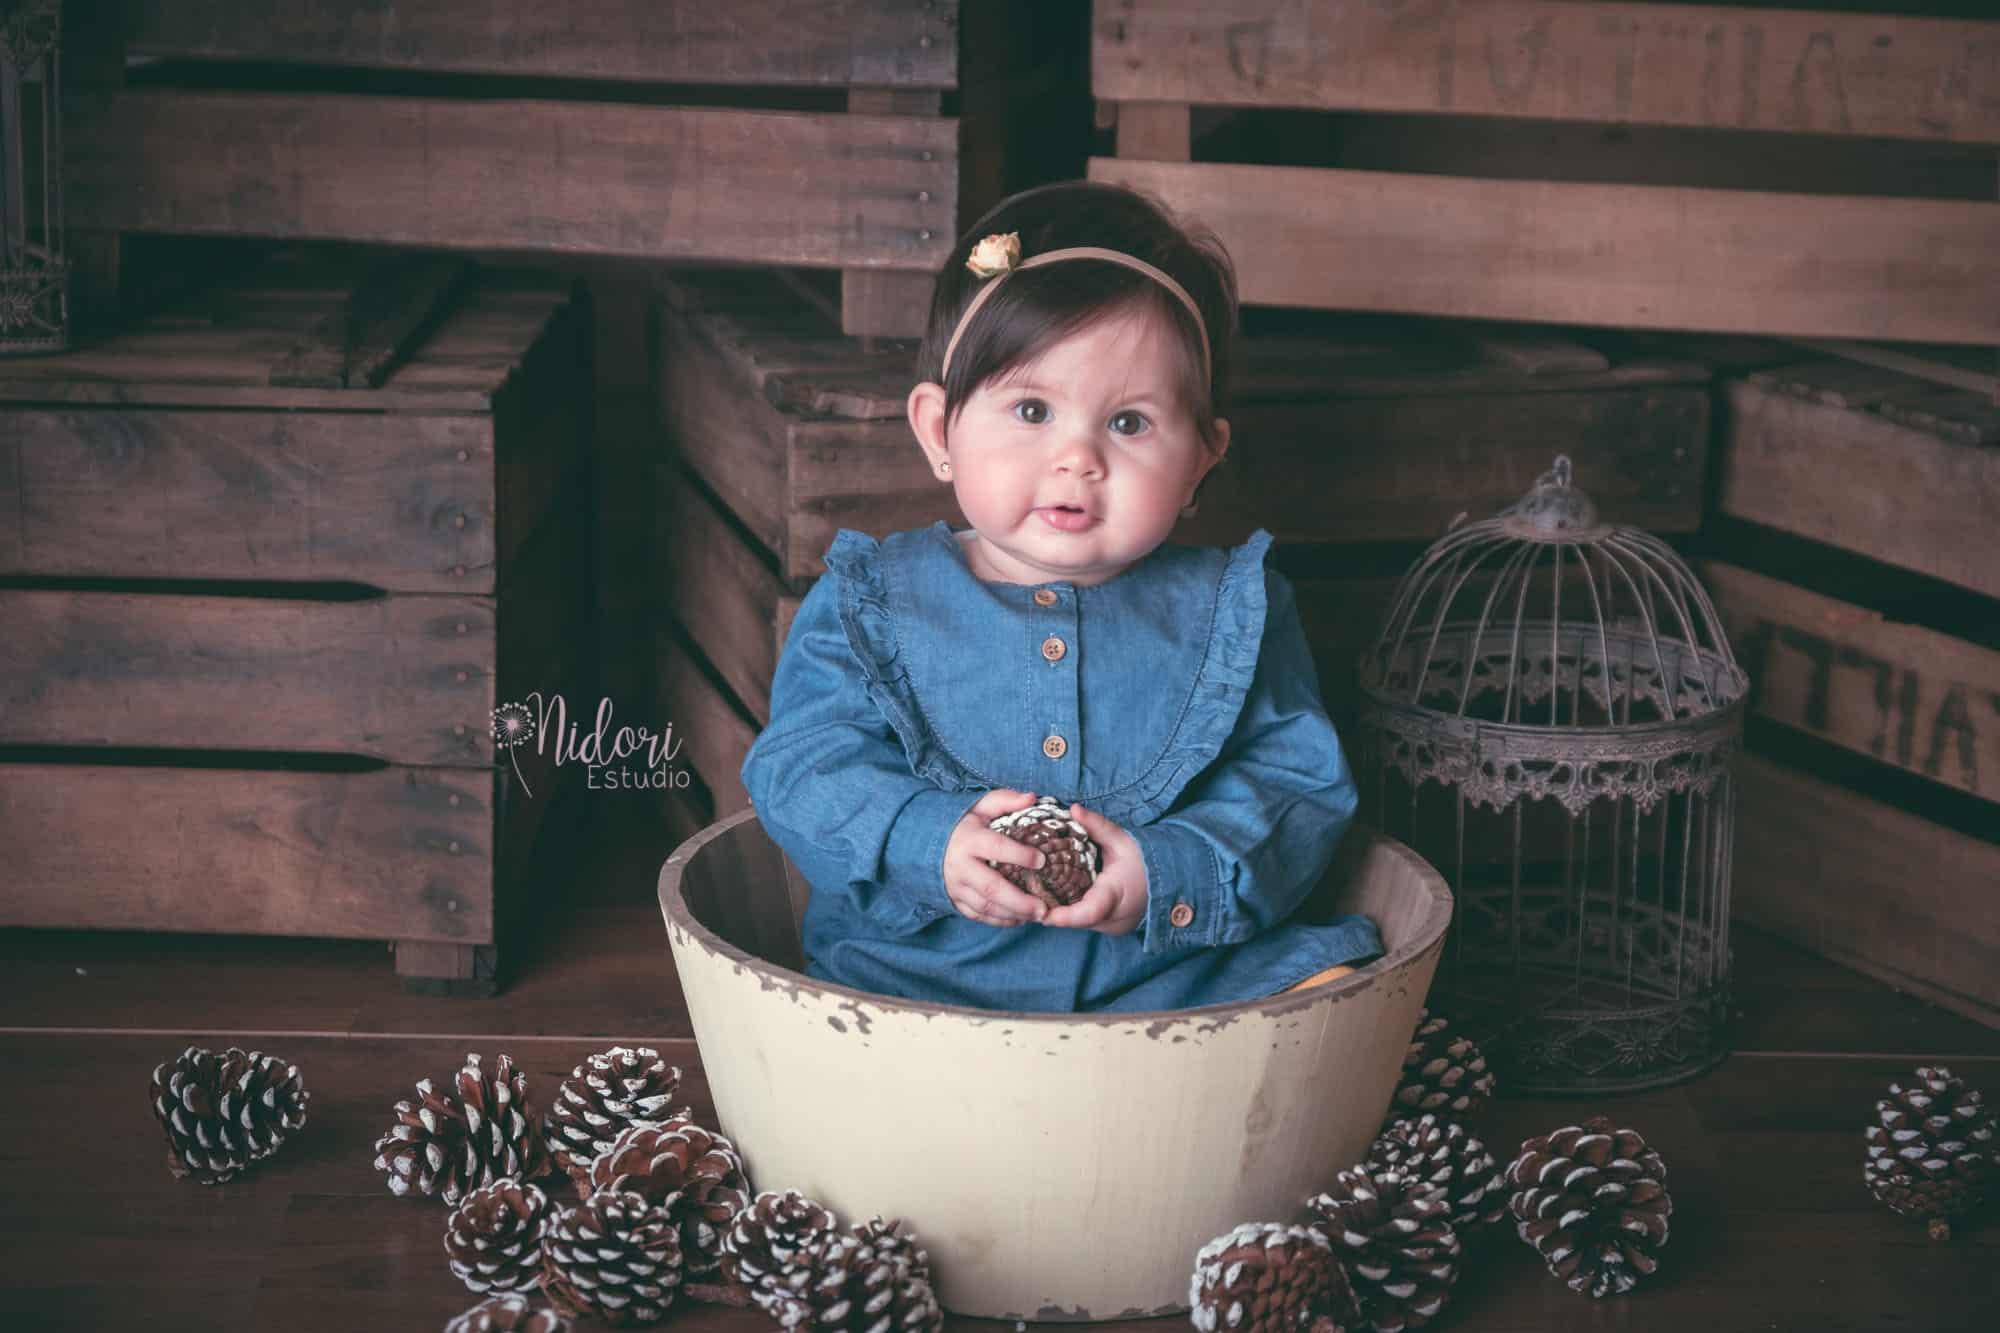 seguimiento-fotografia-niños-bebes-nidoriestudio-fotos-valencia-almazora-castellon-españa-spain-27